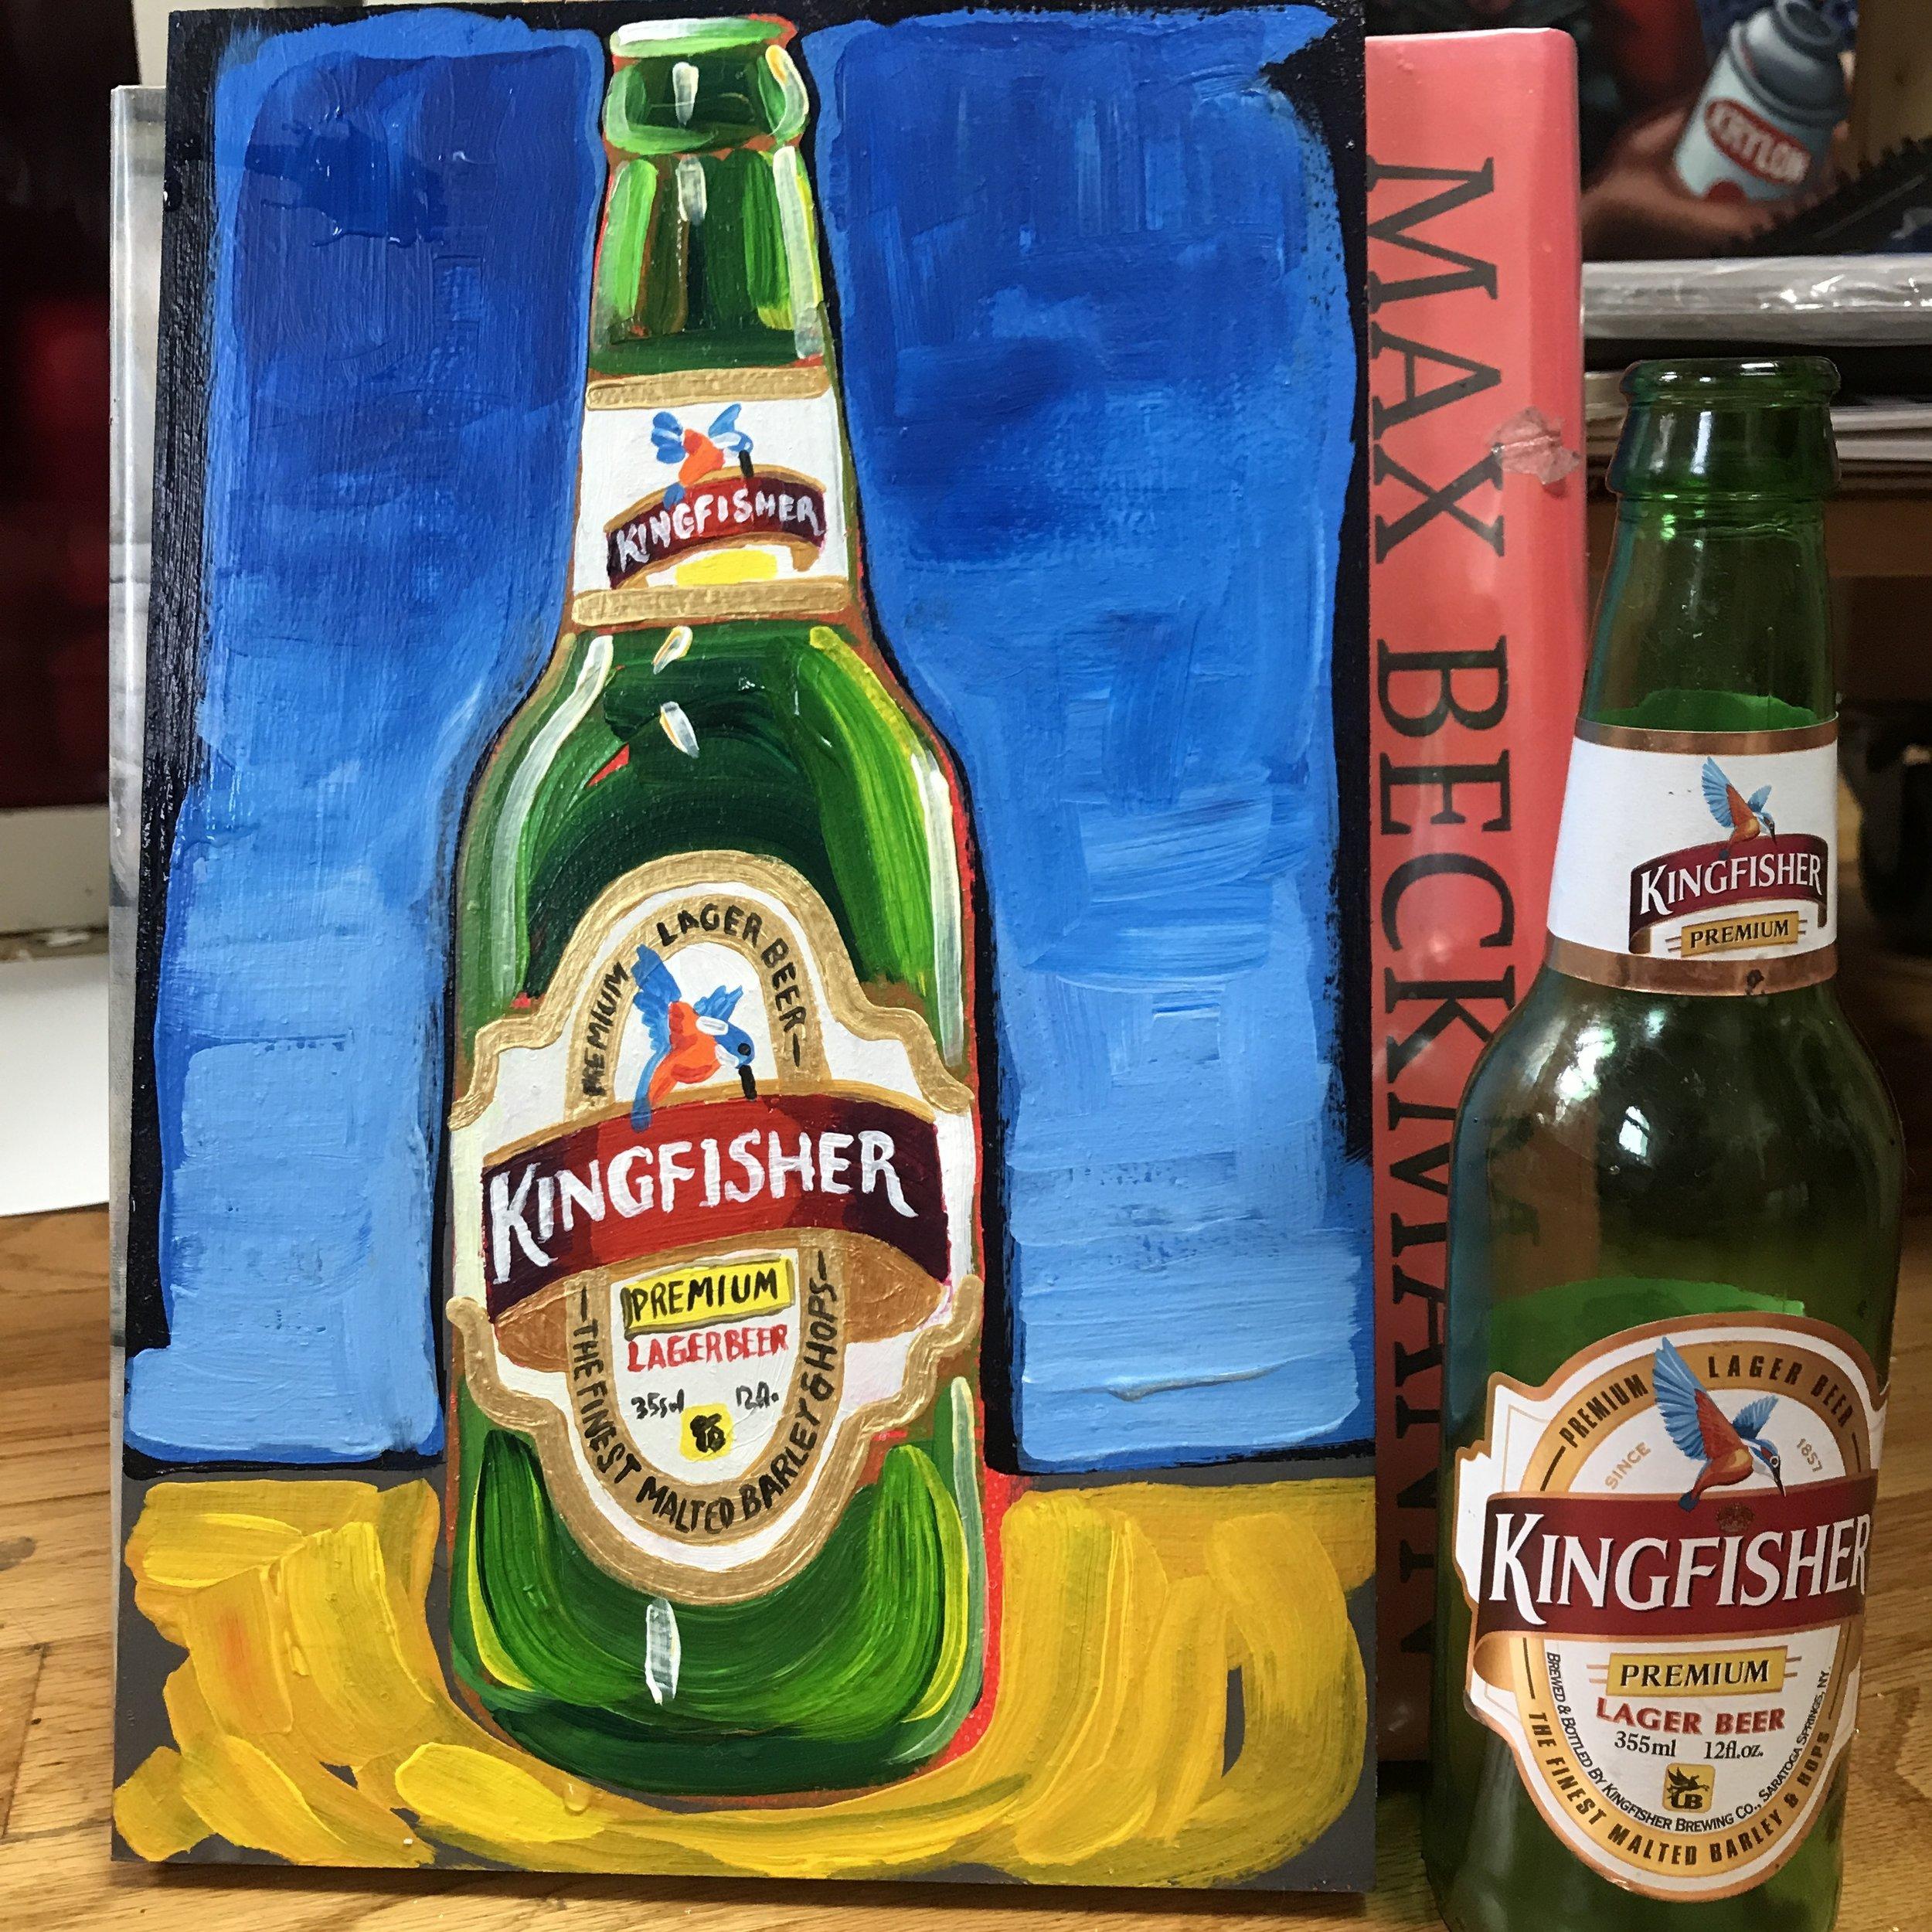 32 Kingfisher Premium Lager Beer (India)